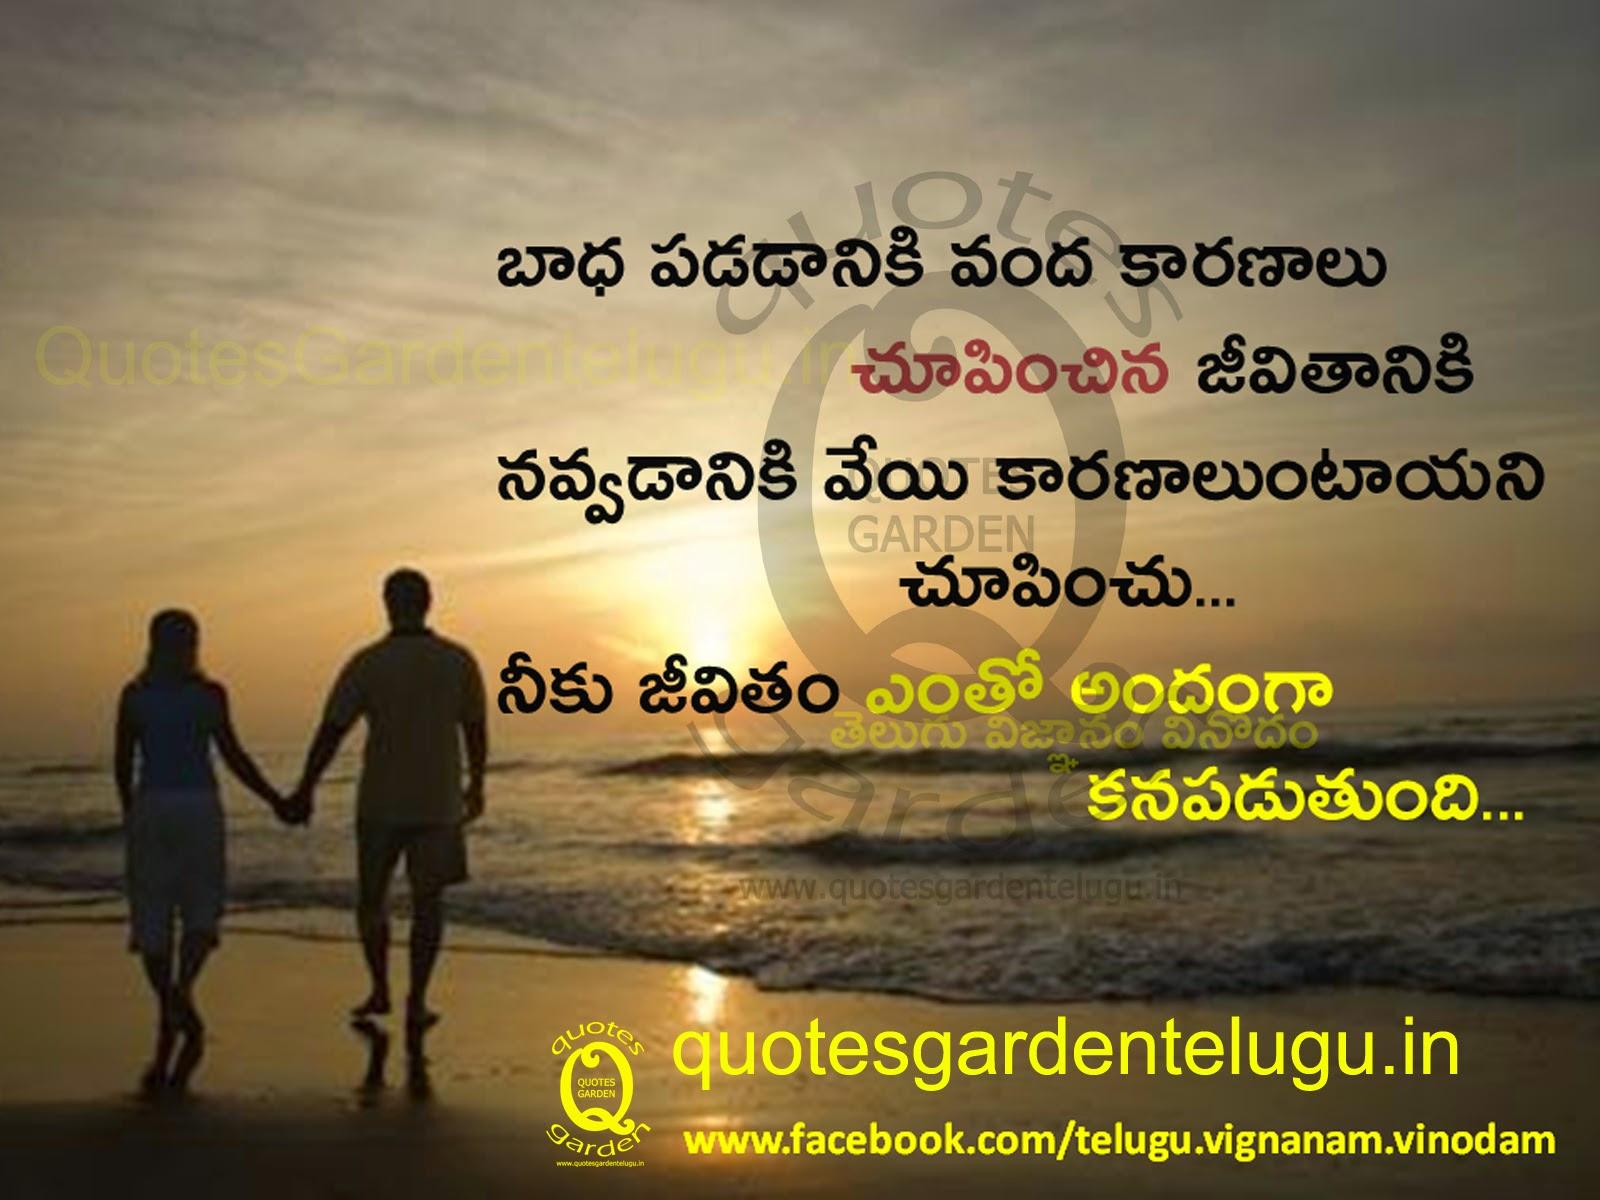 Swami Vivekananda Quotes In Telugu Hd Wallpapers Telugu New Swami